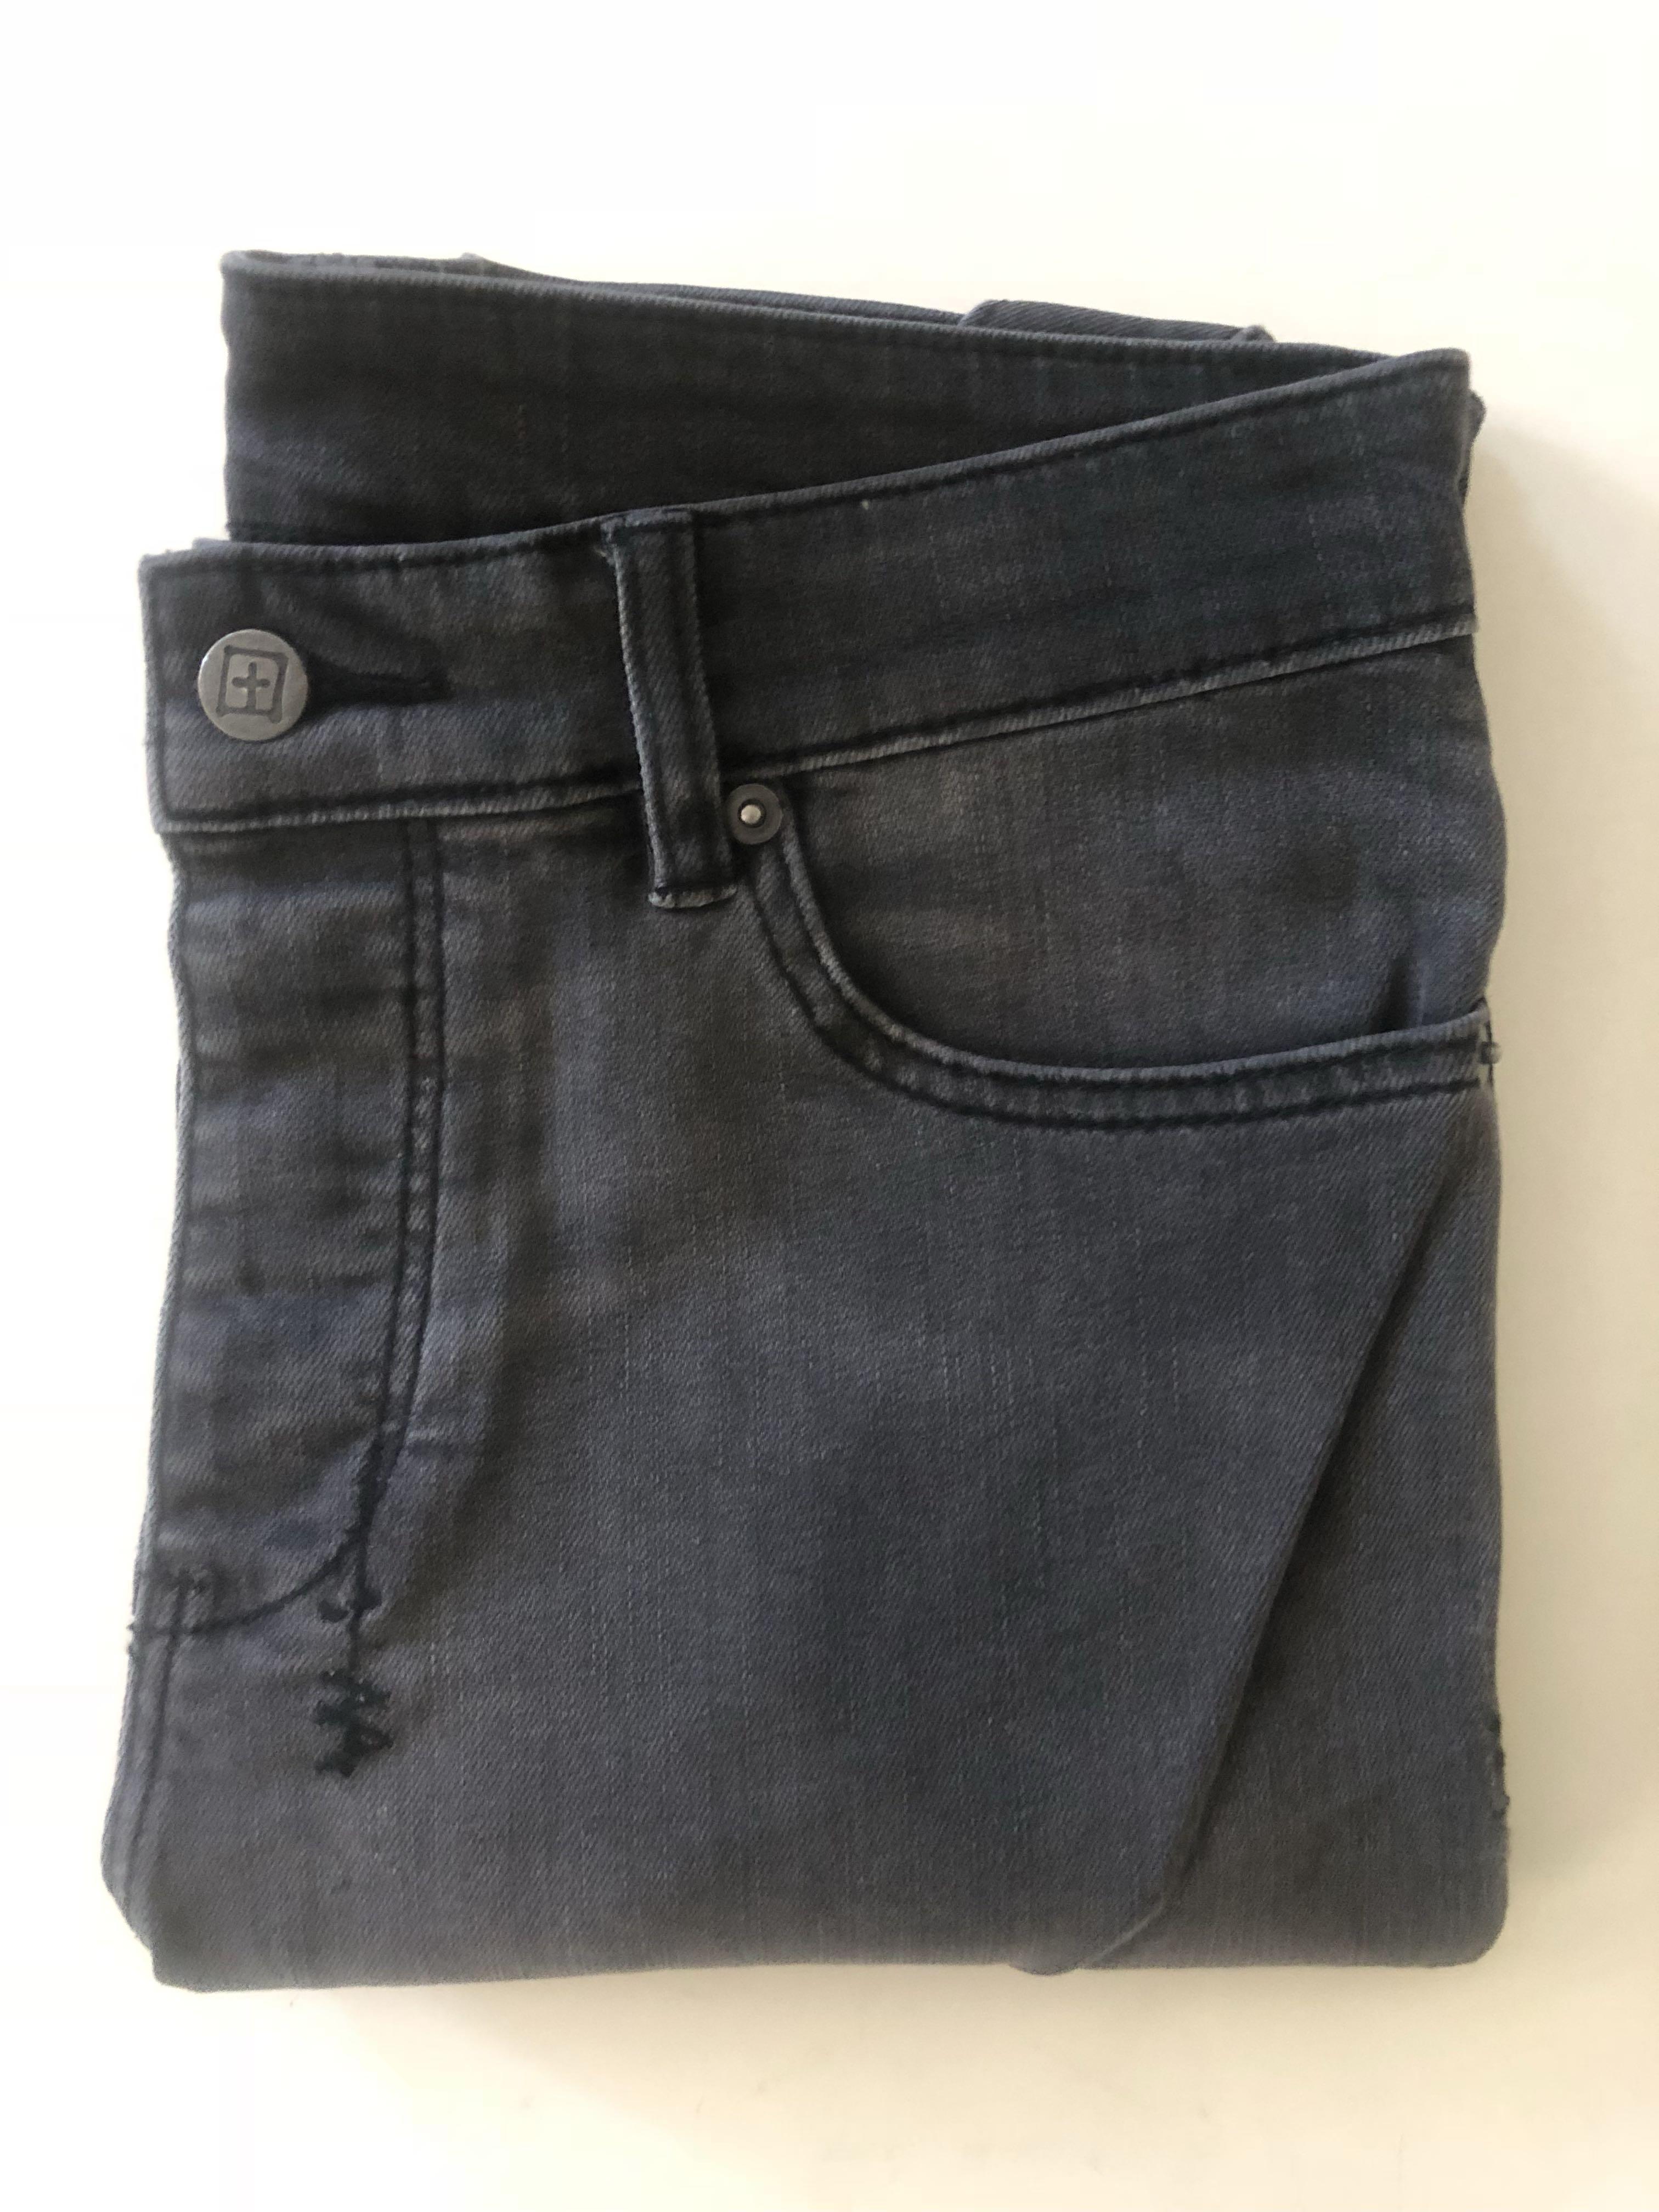 Men's Black Ksubi Jeans - Brand New Without Tag Size 32